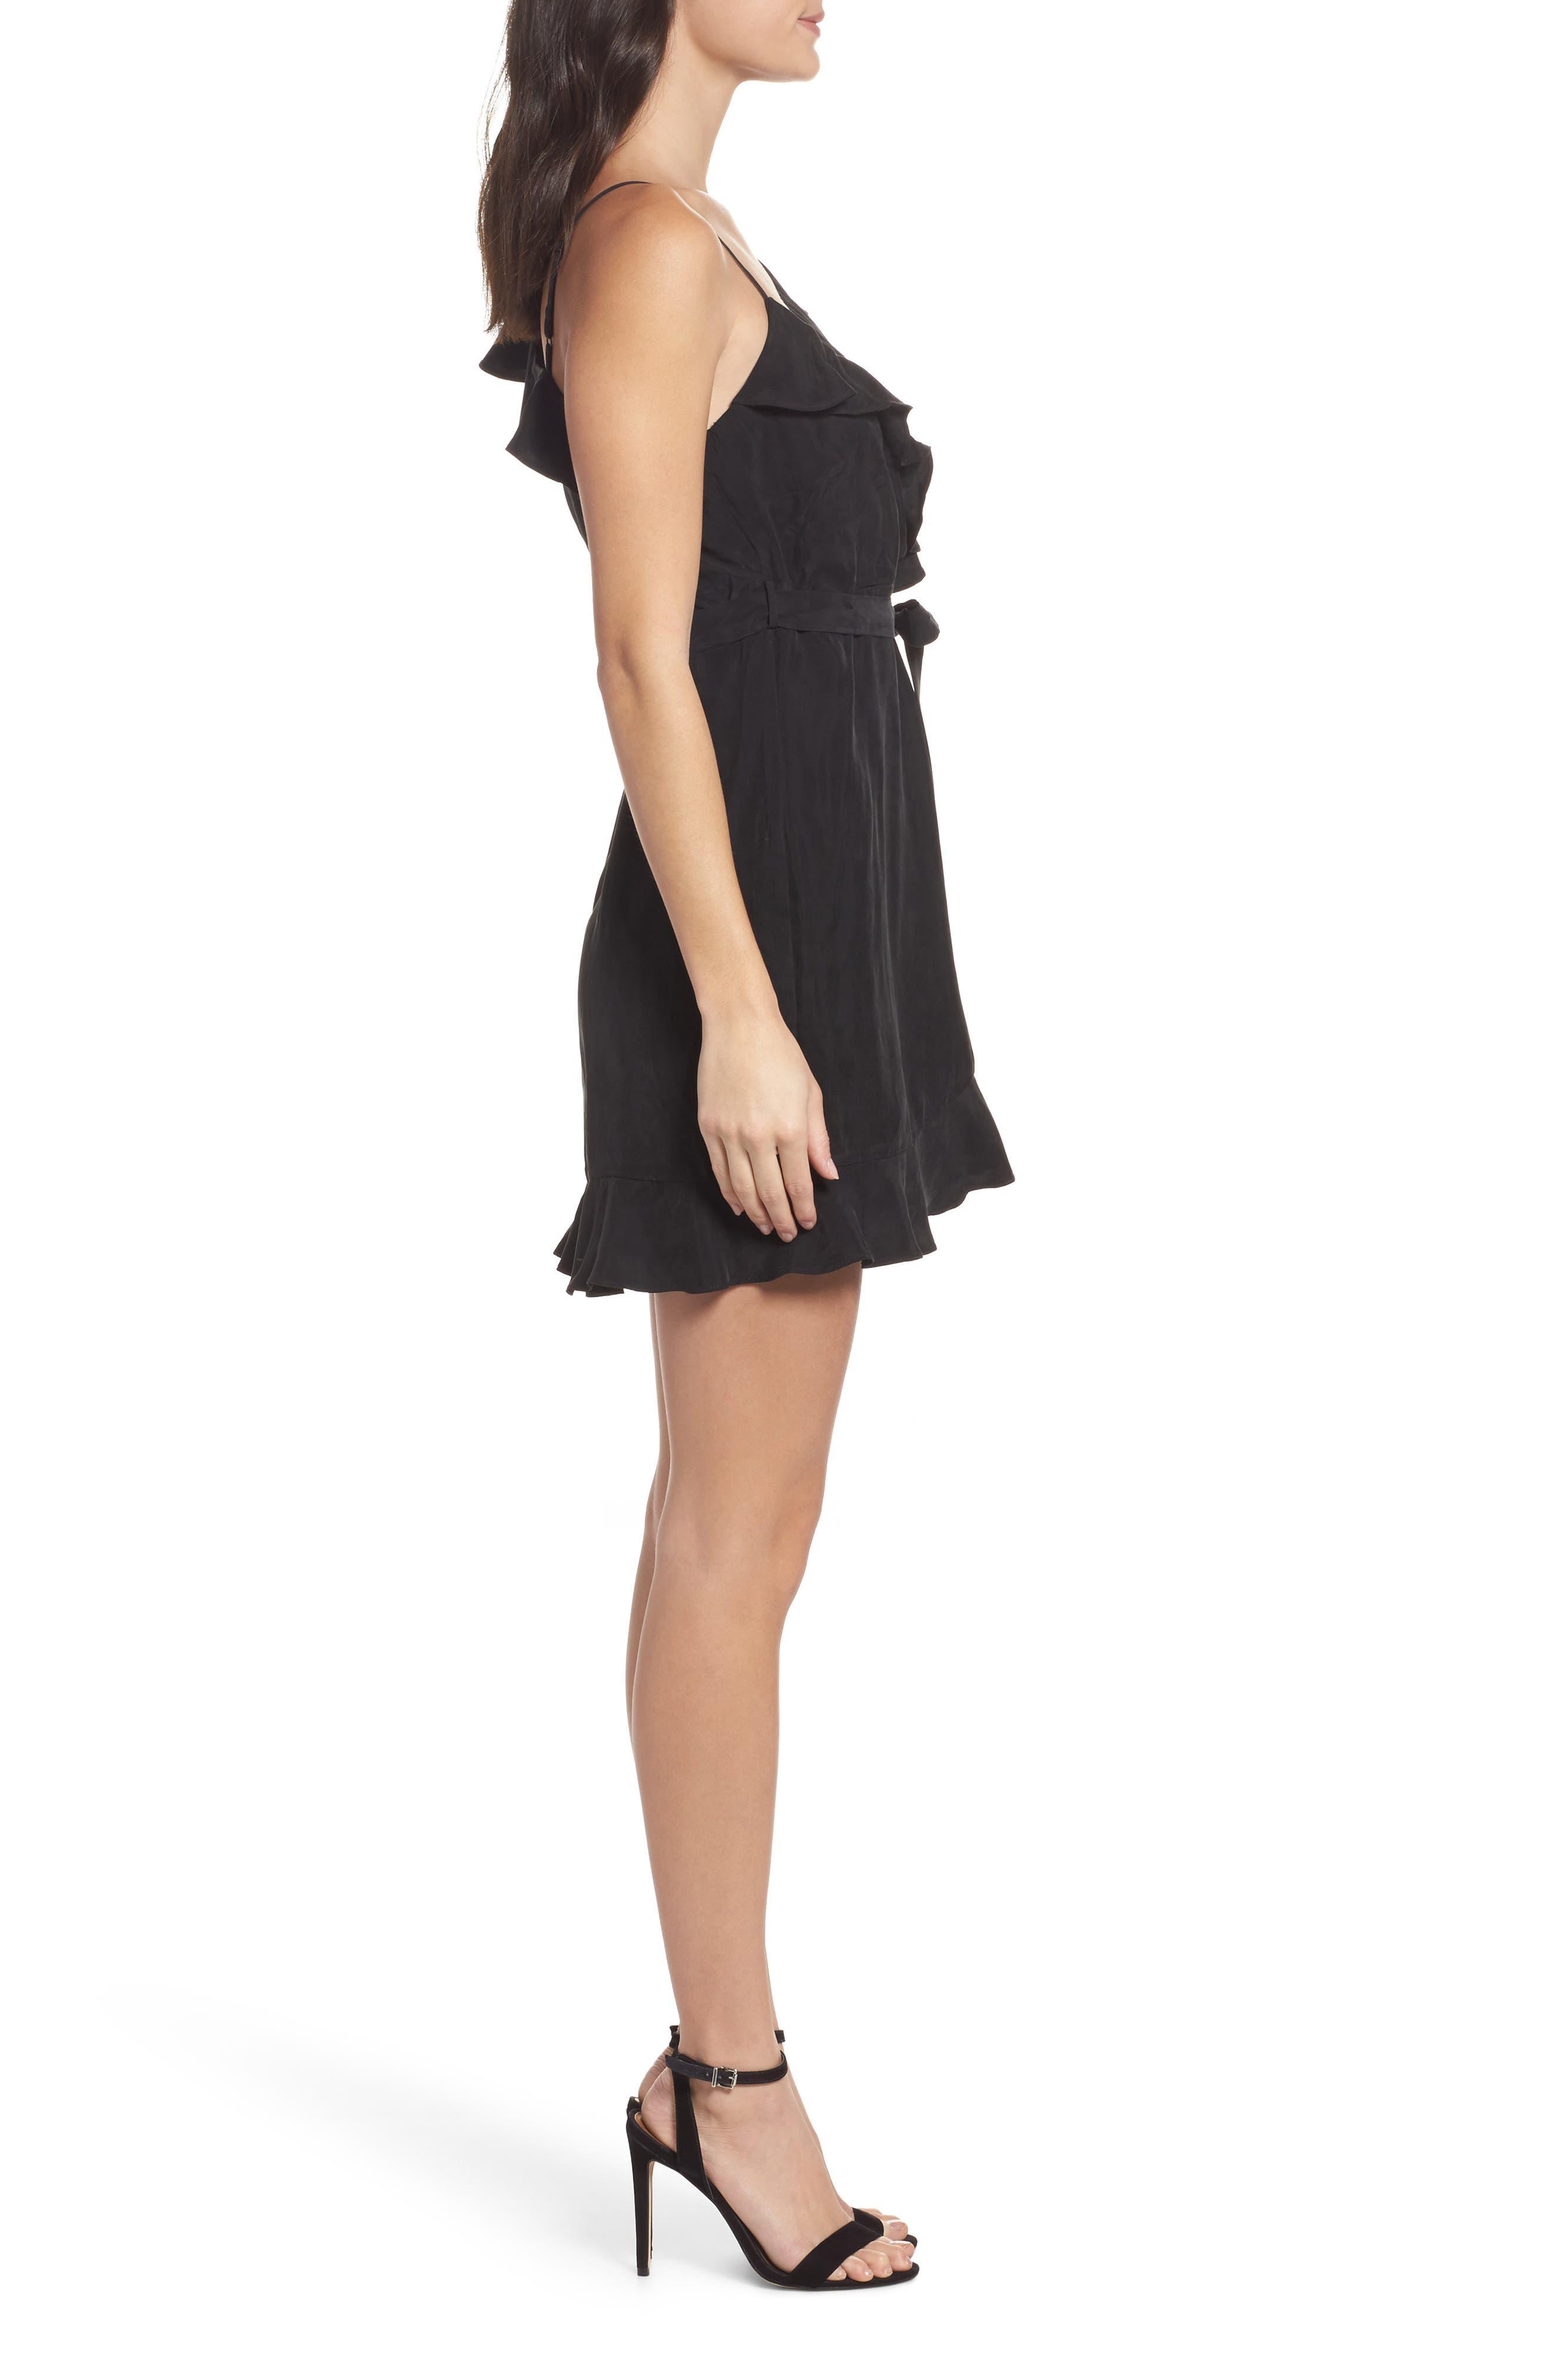 Milly One-Shoulder Wrap Dress,                             Alternate thumbnail 3, color,                             Black